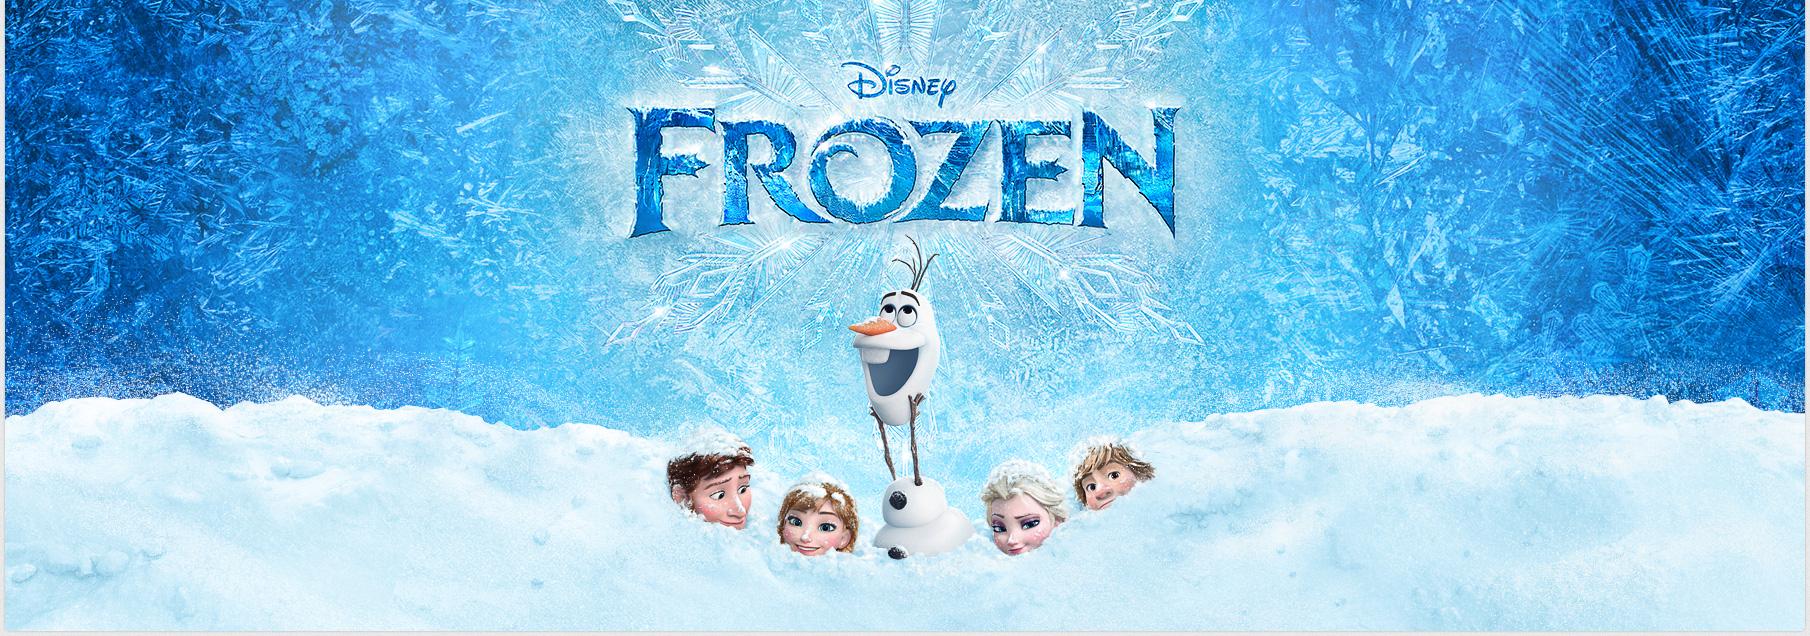 http://cdn.dolimg.com/franchise/frozen/images/background_logo.jpg